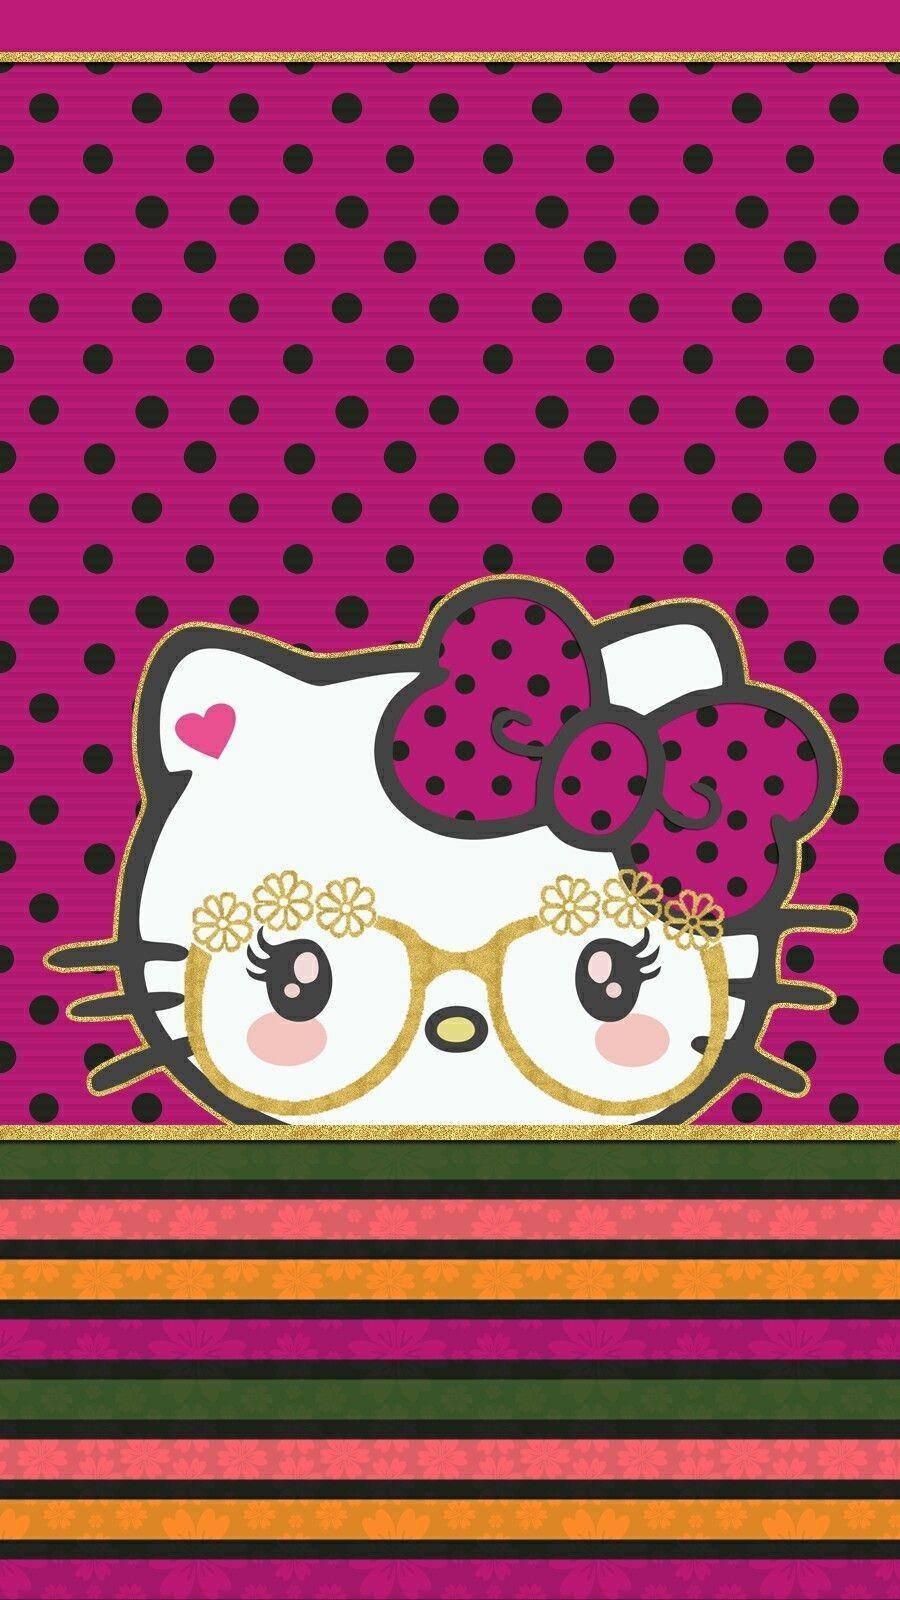 Pin by 🎀 Amira 🎀 on Matching Themes Hello kitty